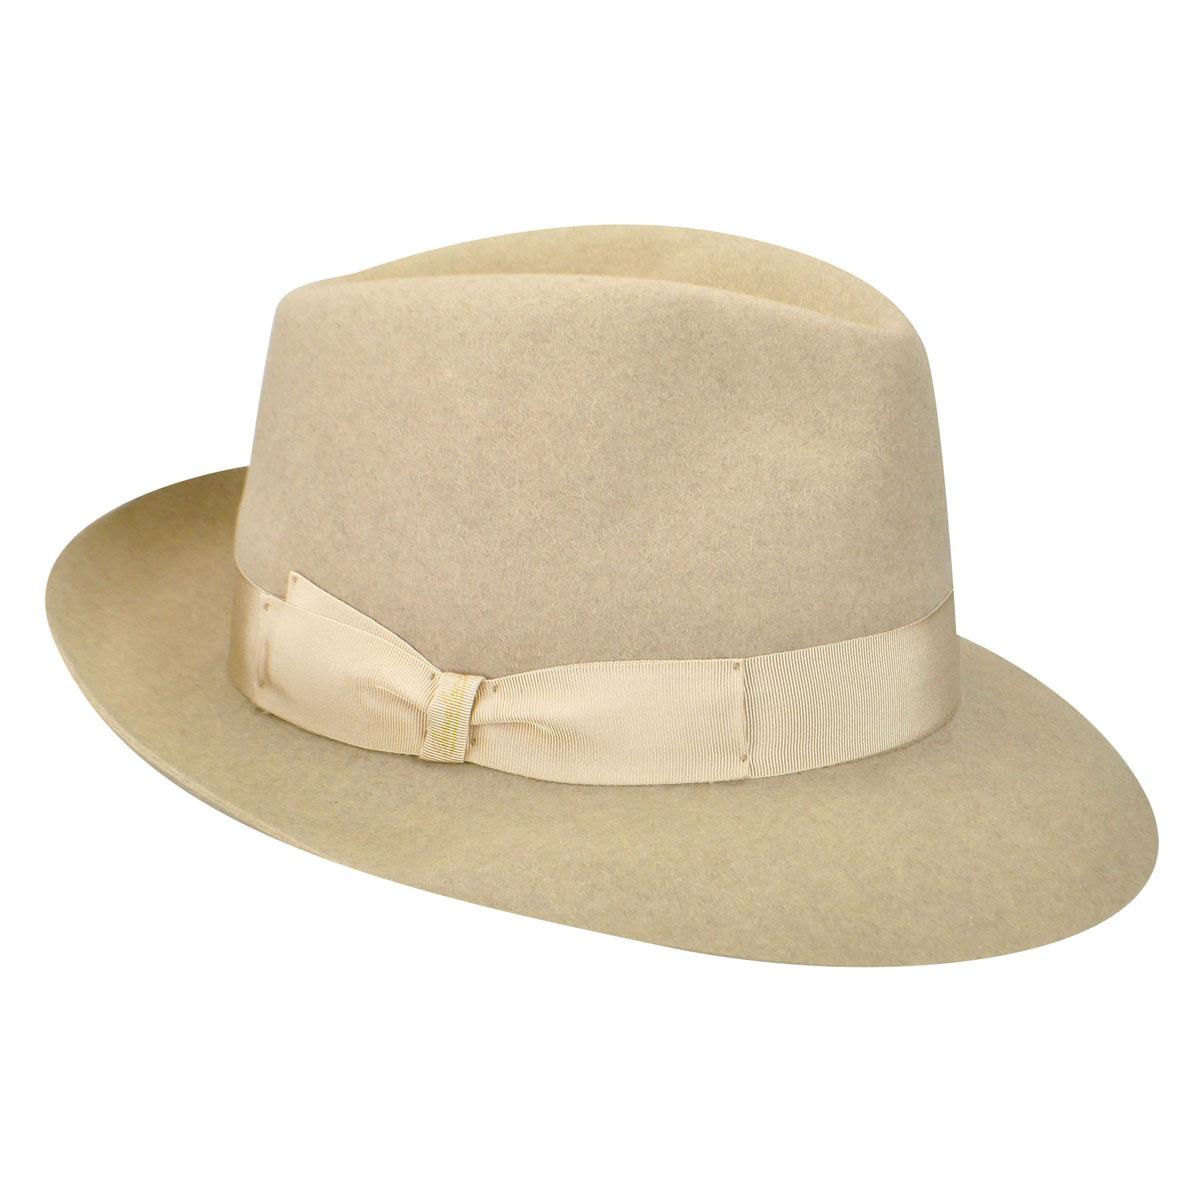 213021 Qualita Superiore Fur Felt Fedora $368.00 AT vintagedancer.com